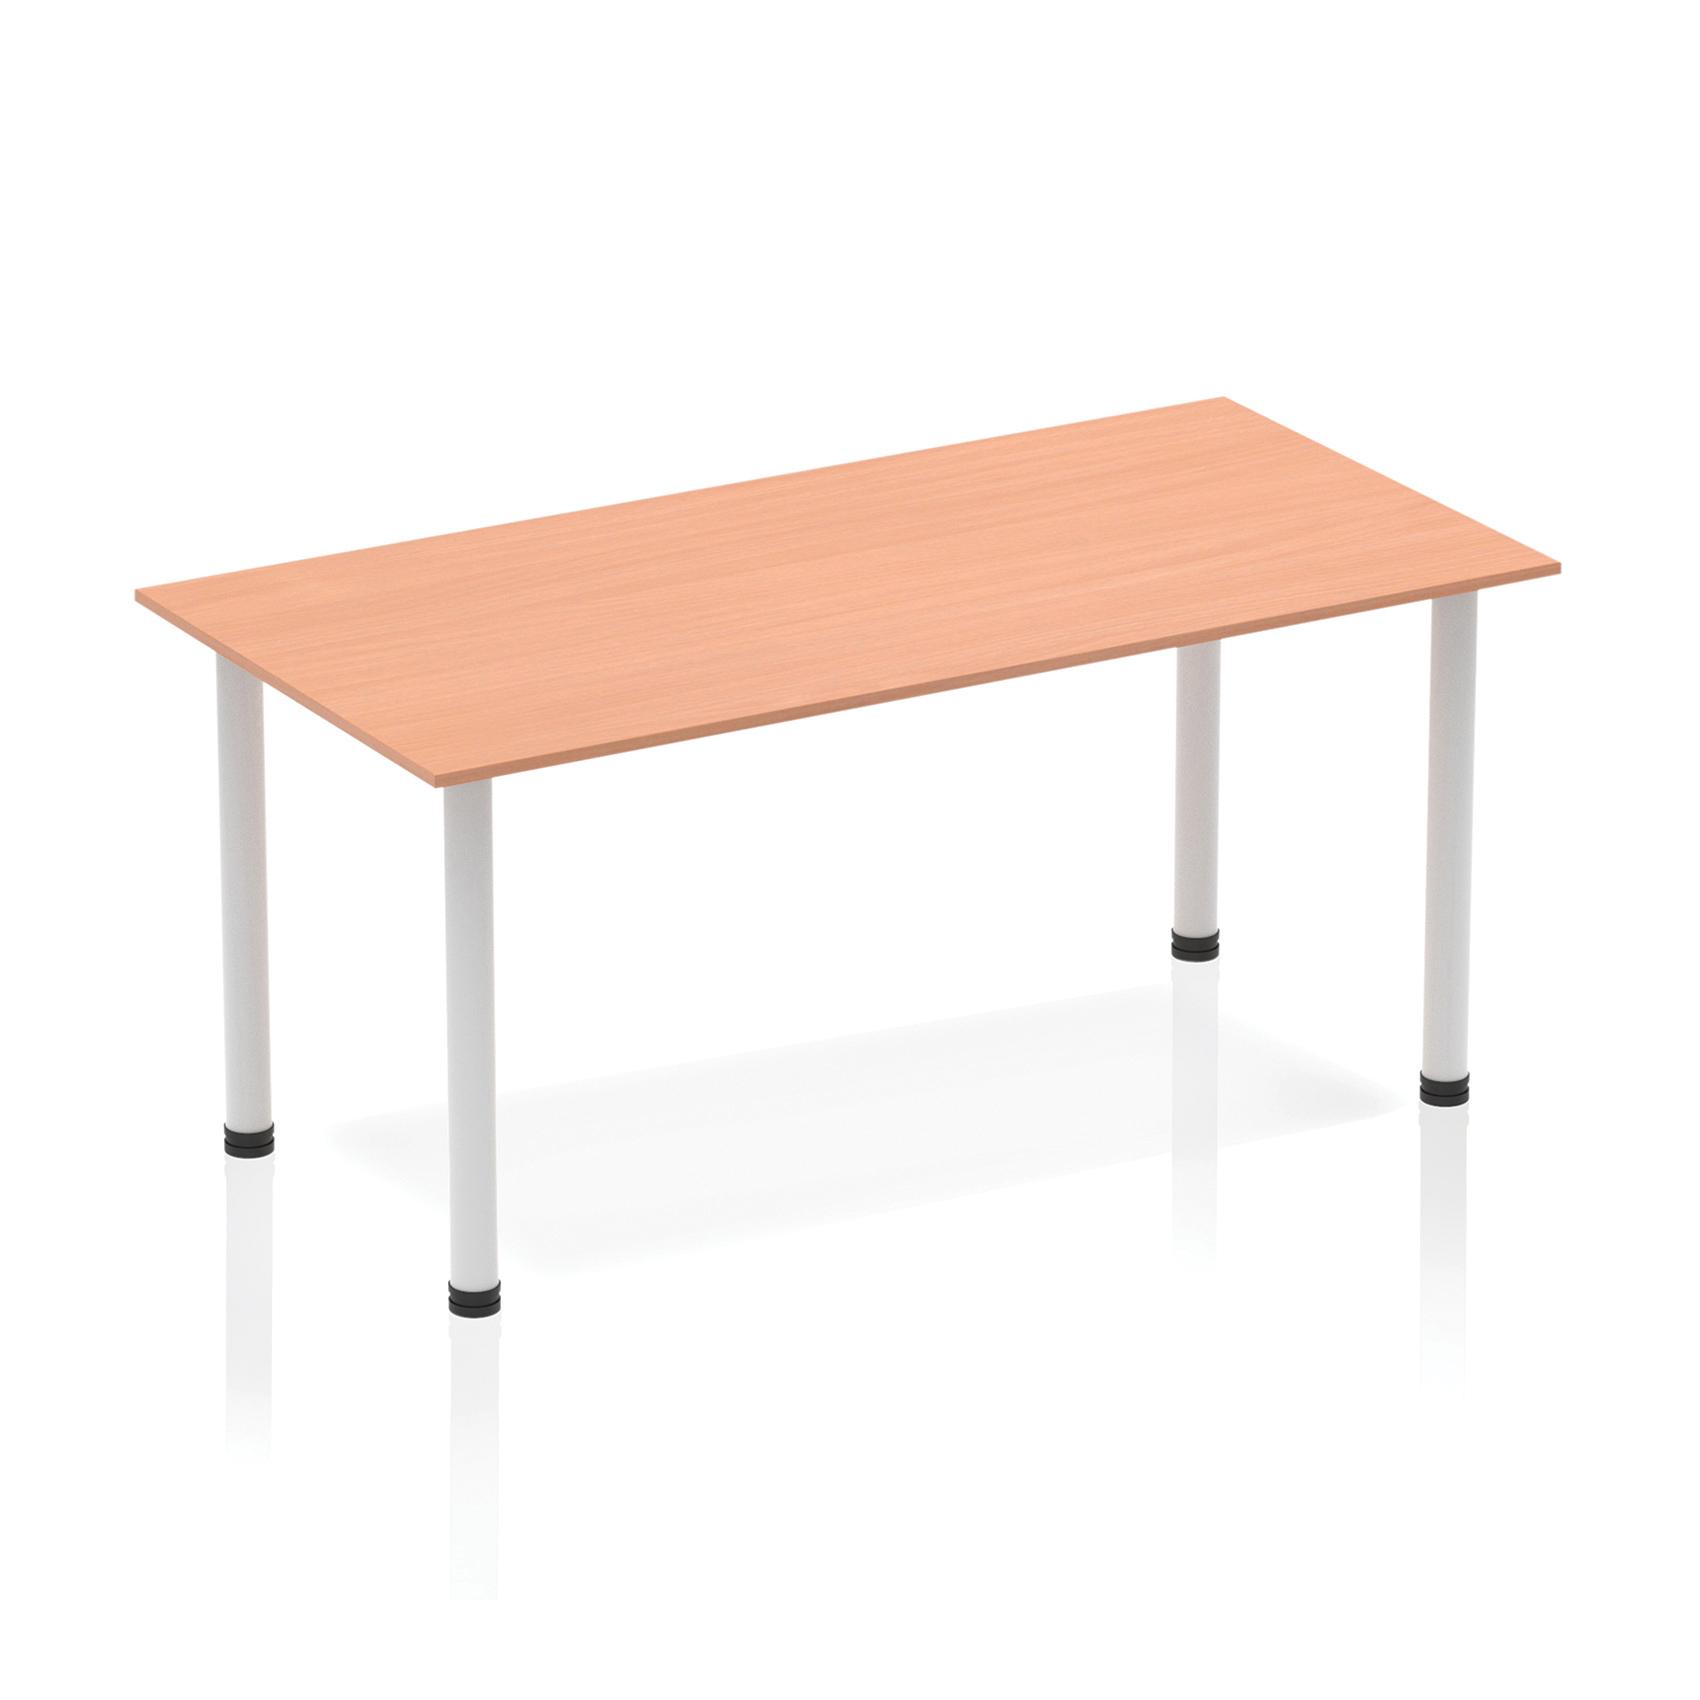 Trexus Straight Table Post Leg Silver 1400 Beech Ref BF00167